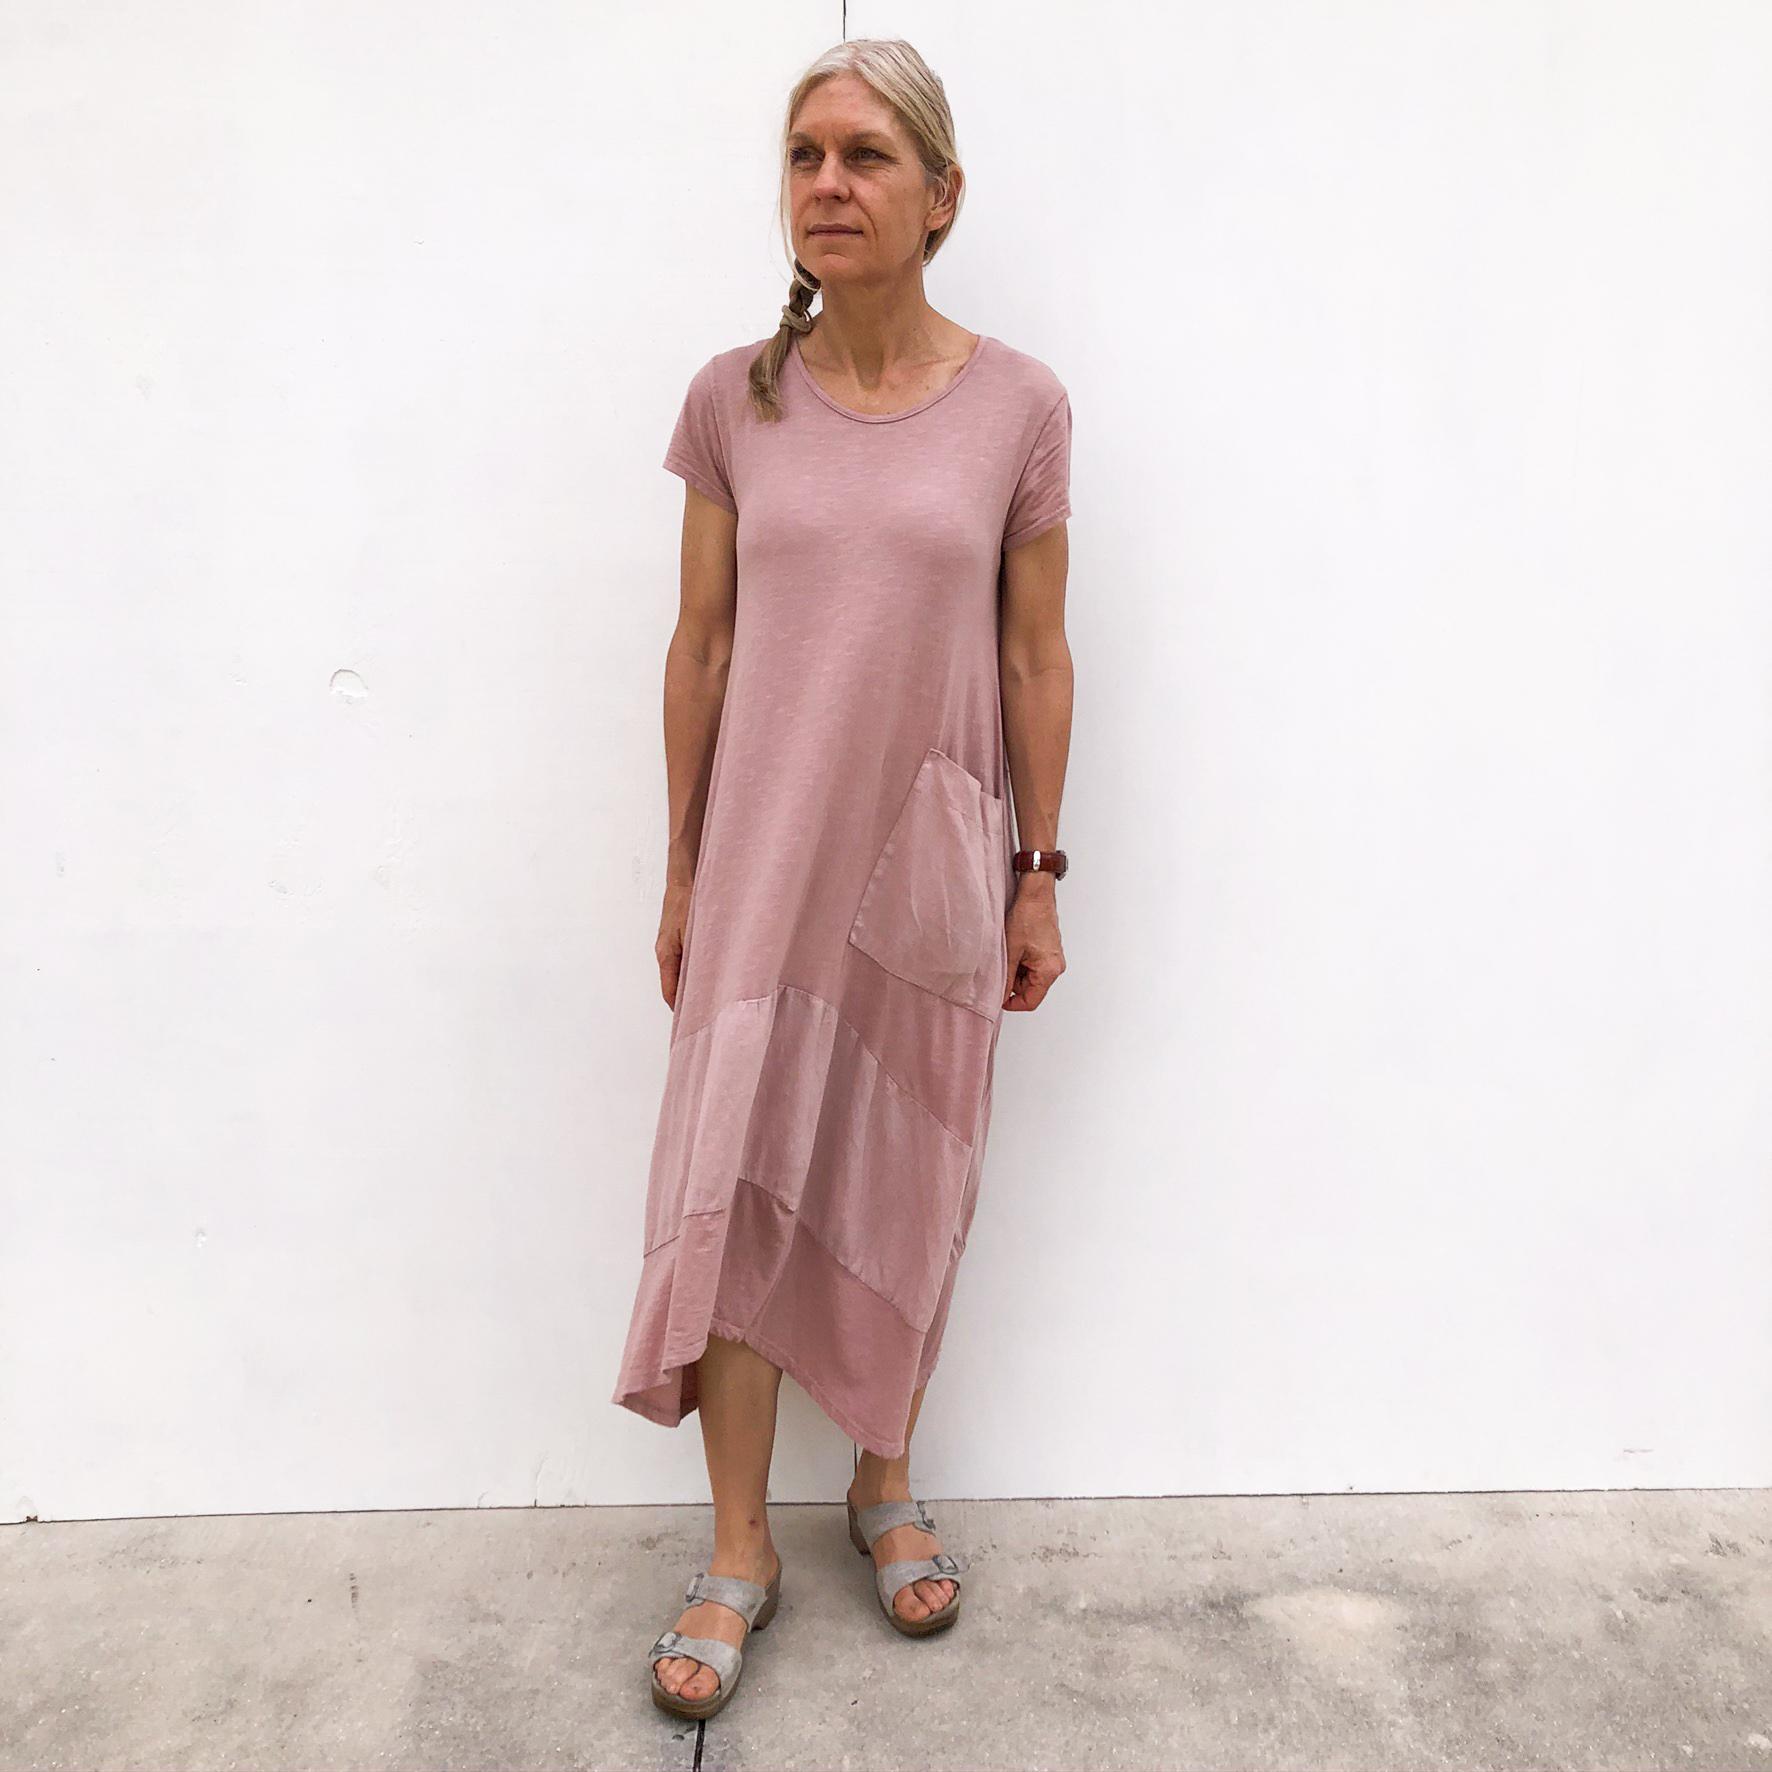 Long Pocket Linen/Cotton Dress on Model - Rose